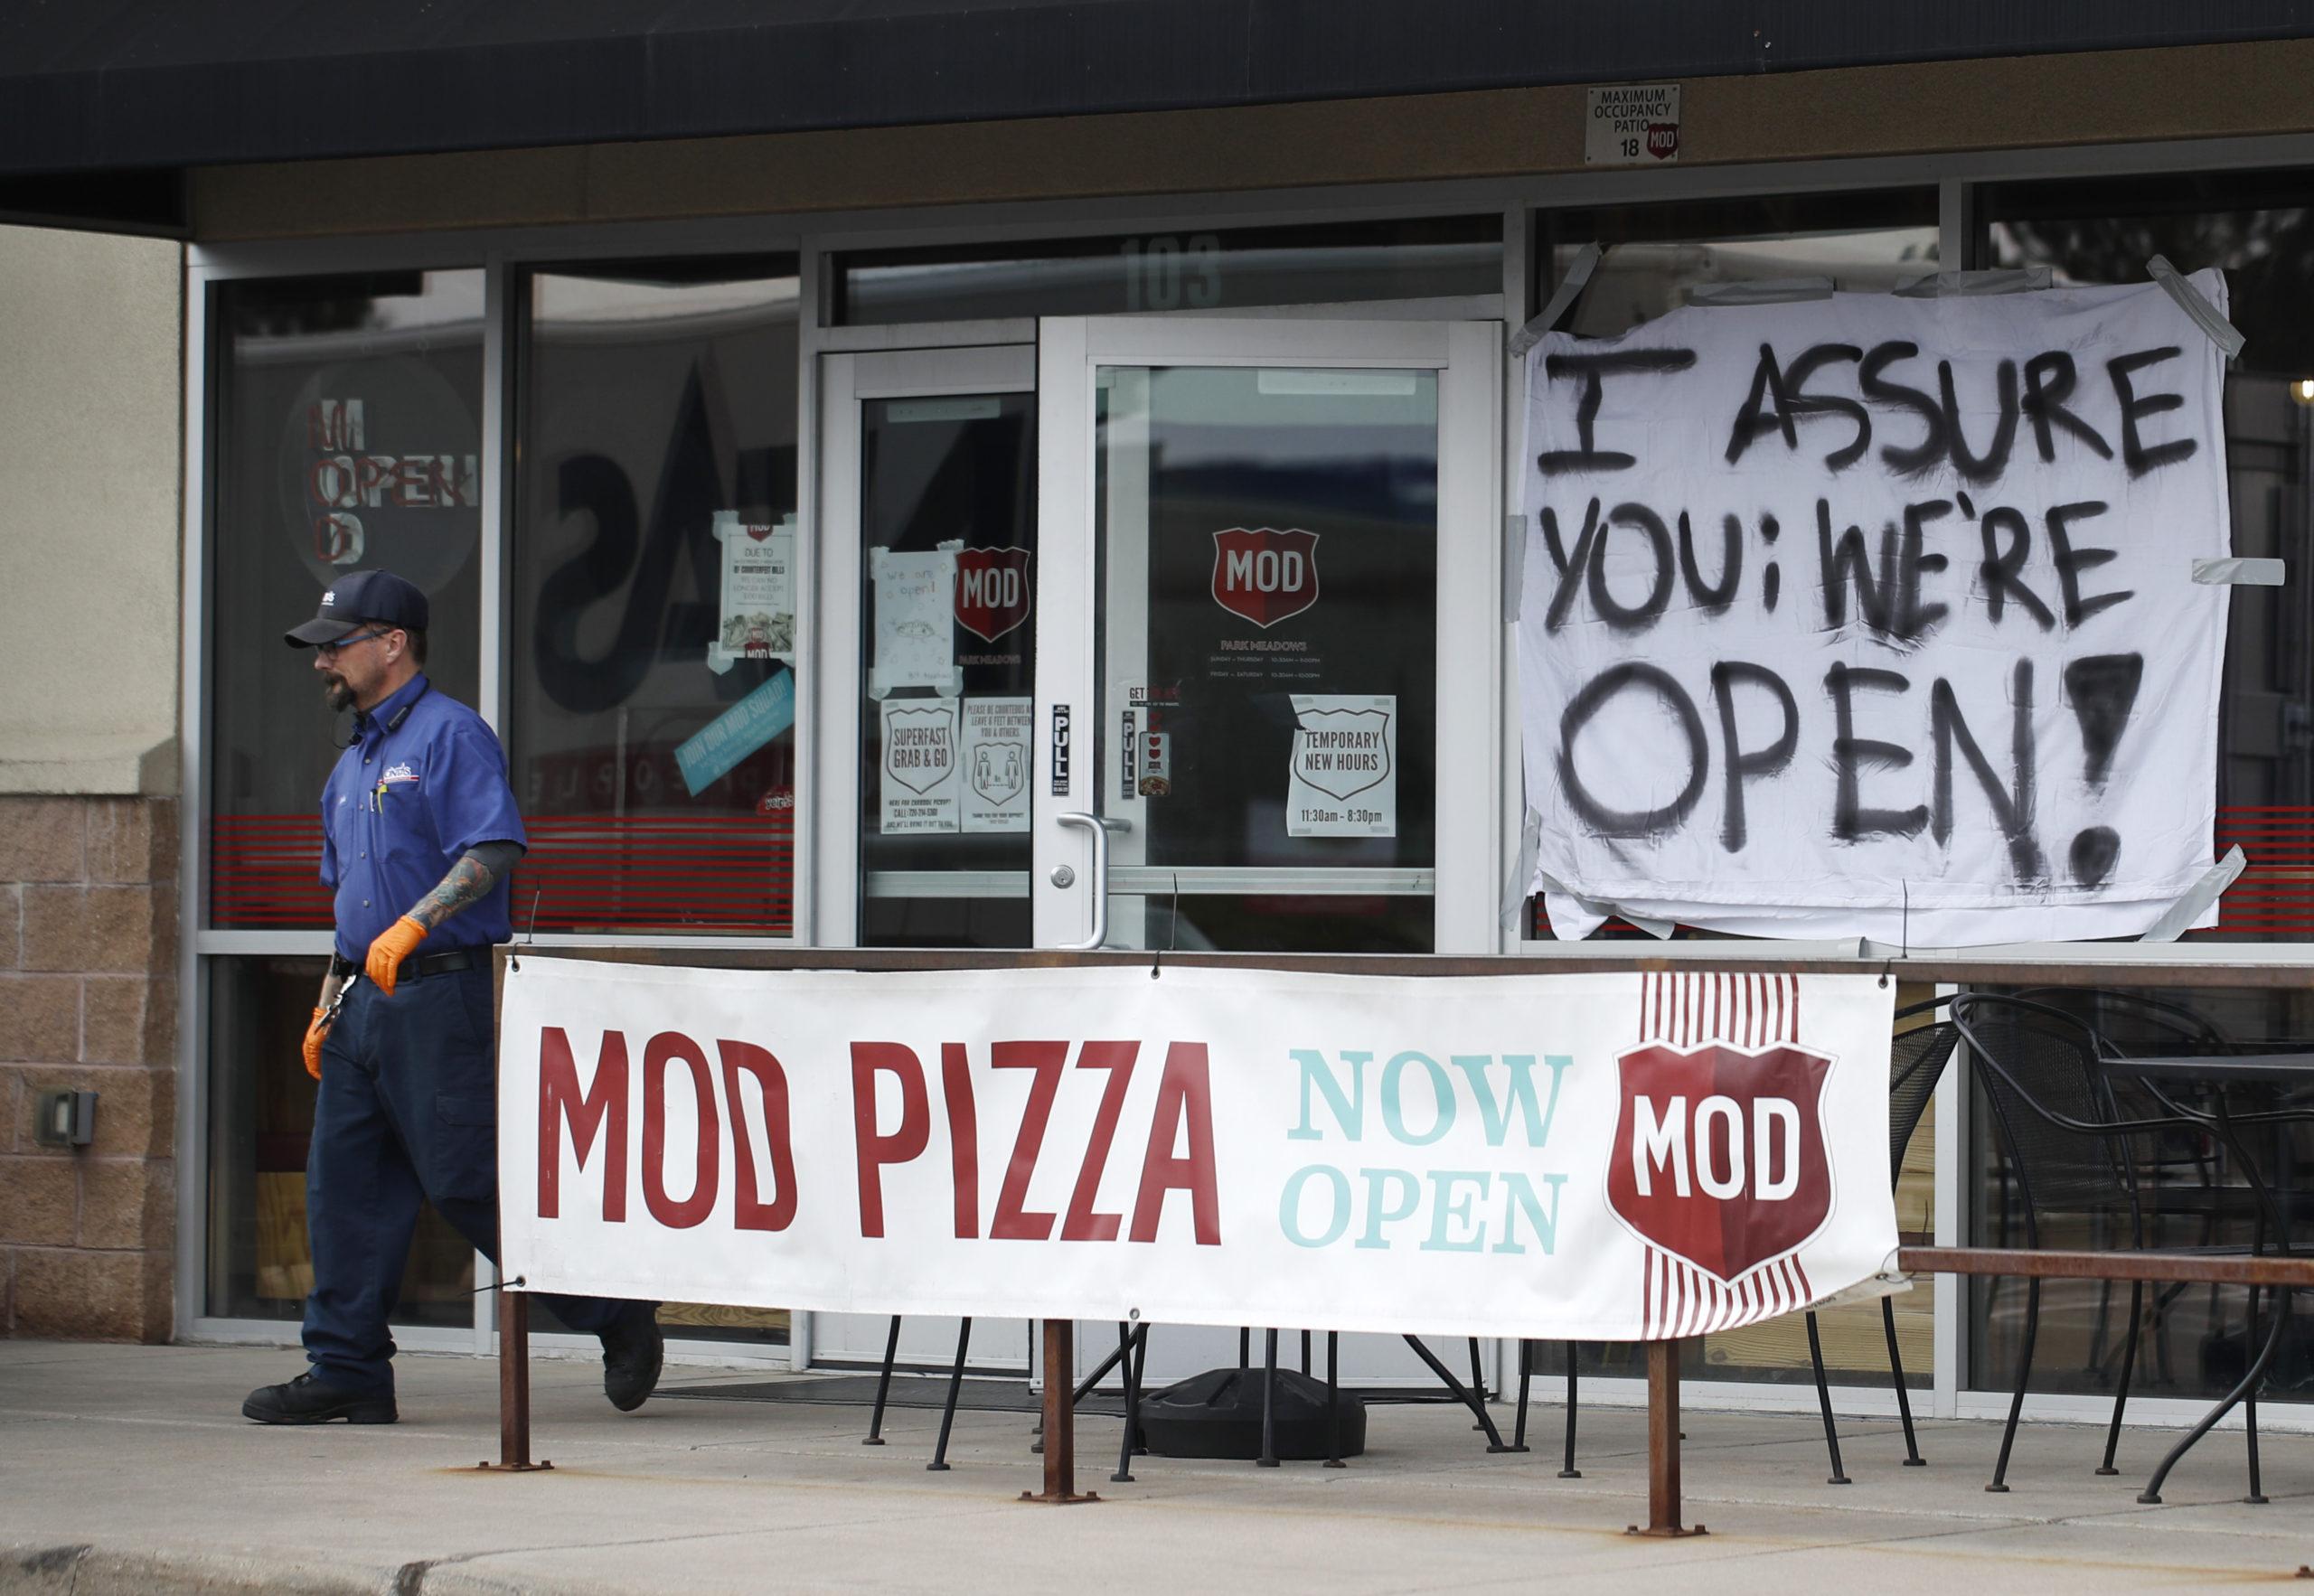 mod pizza still open, r m